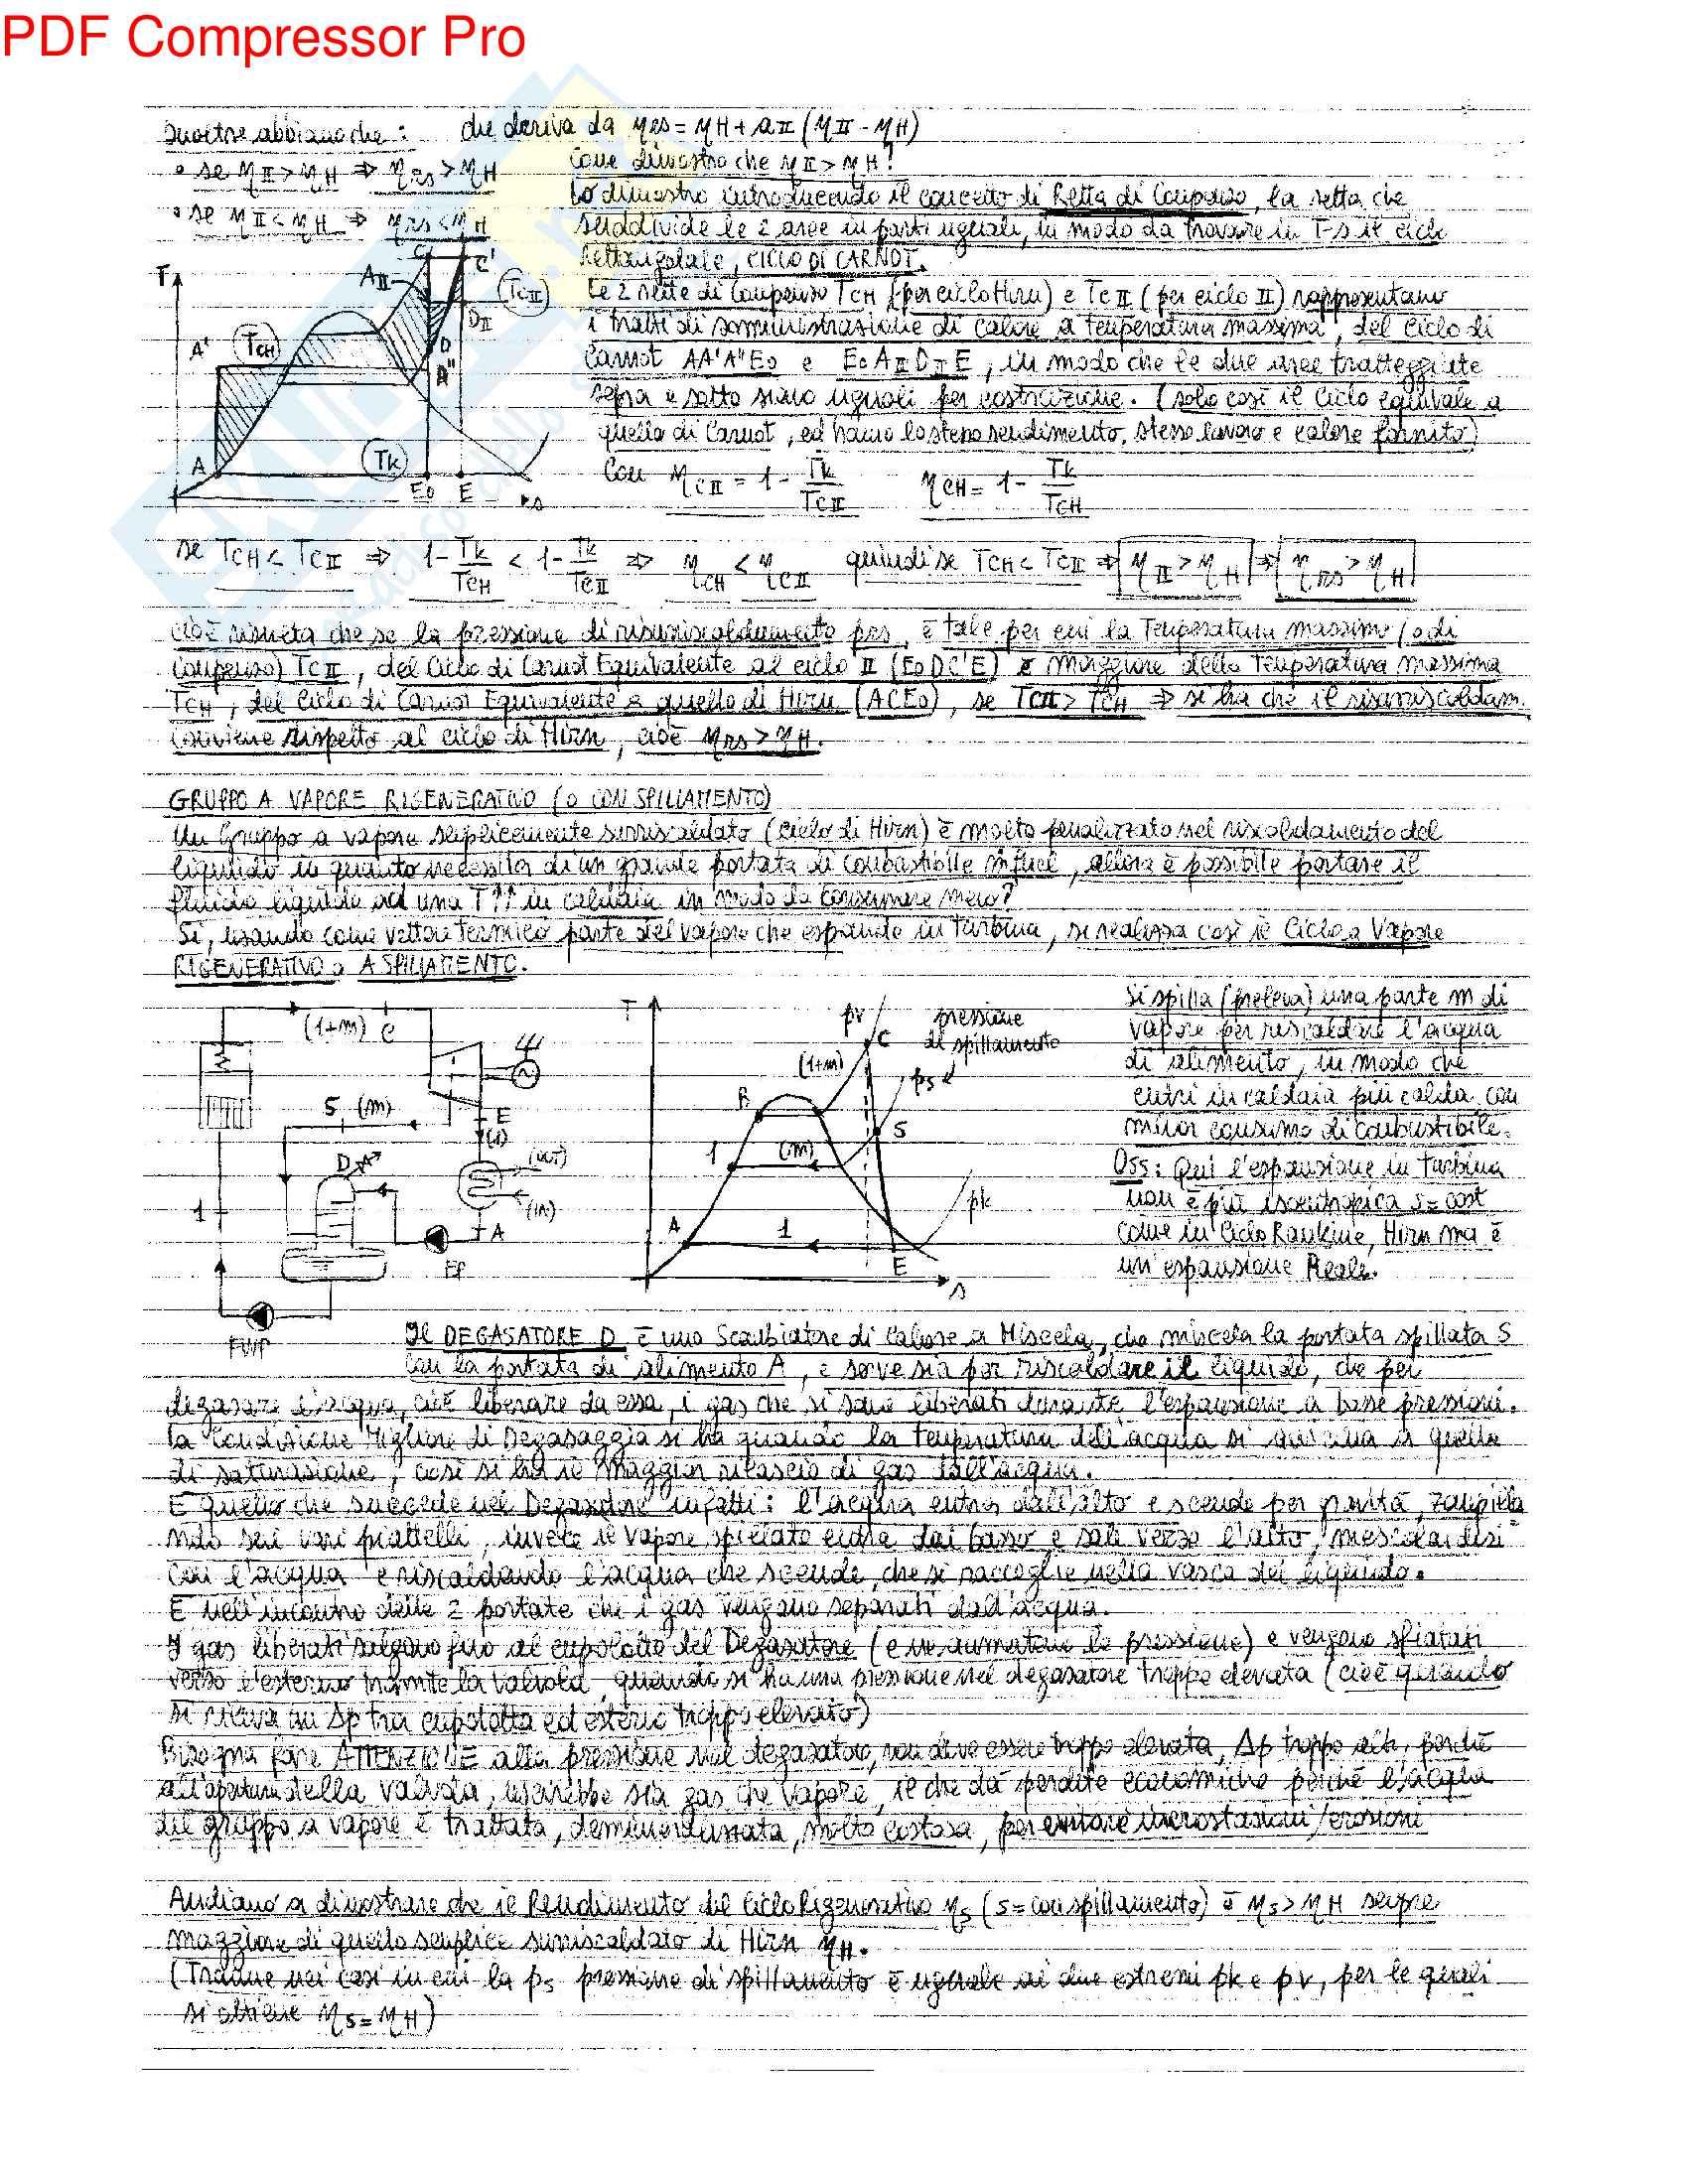 Riassunto esame Sistemi Energetici, prof. Peretto, libri consigliati Sistemi Energetici 1 - Machine a Fluido G. Negri di Montenegro, M. Bianchi, A. Peretto Pag. 31